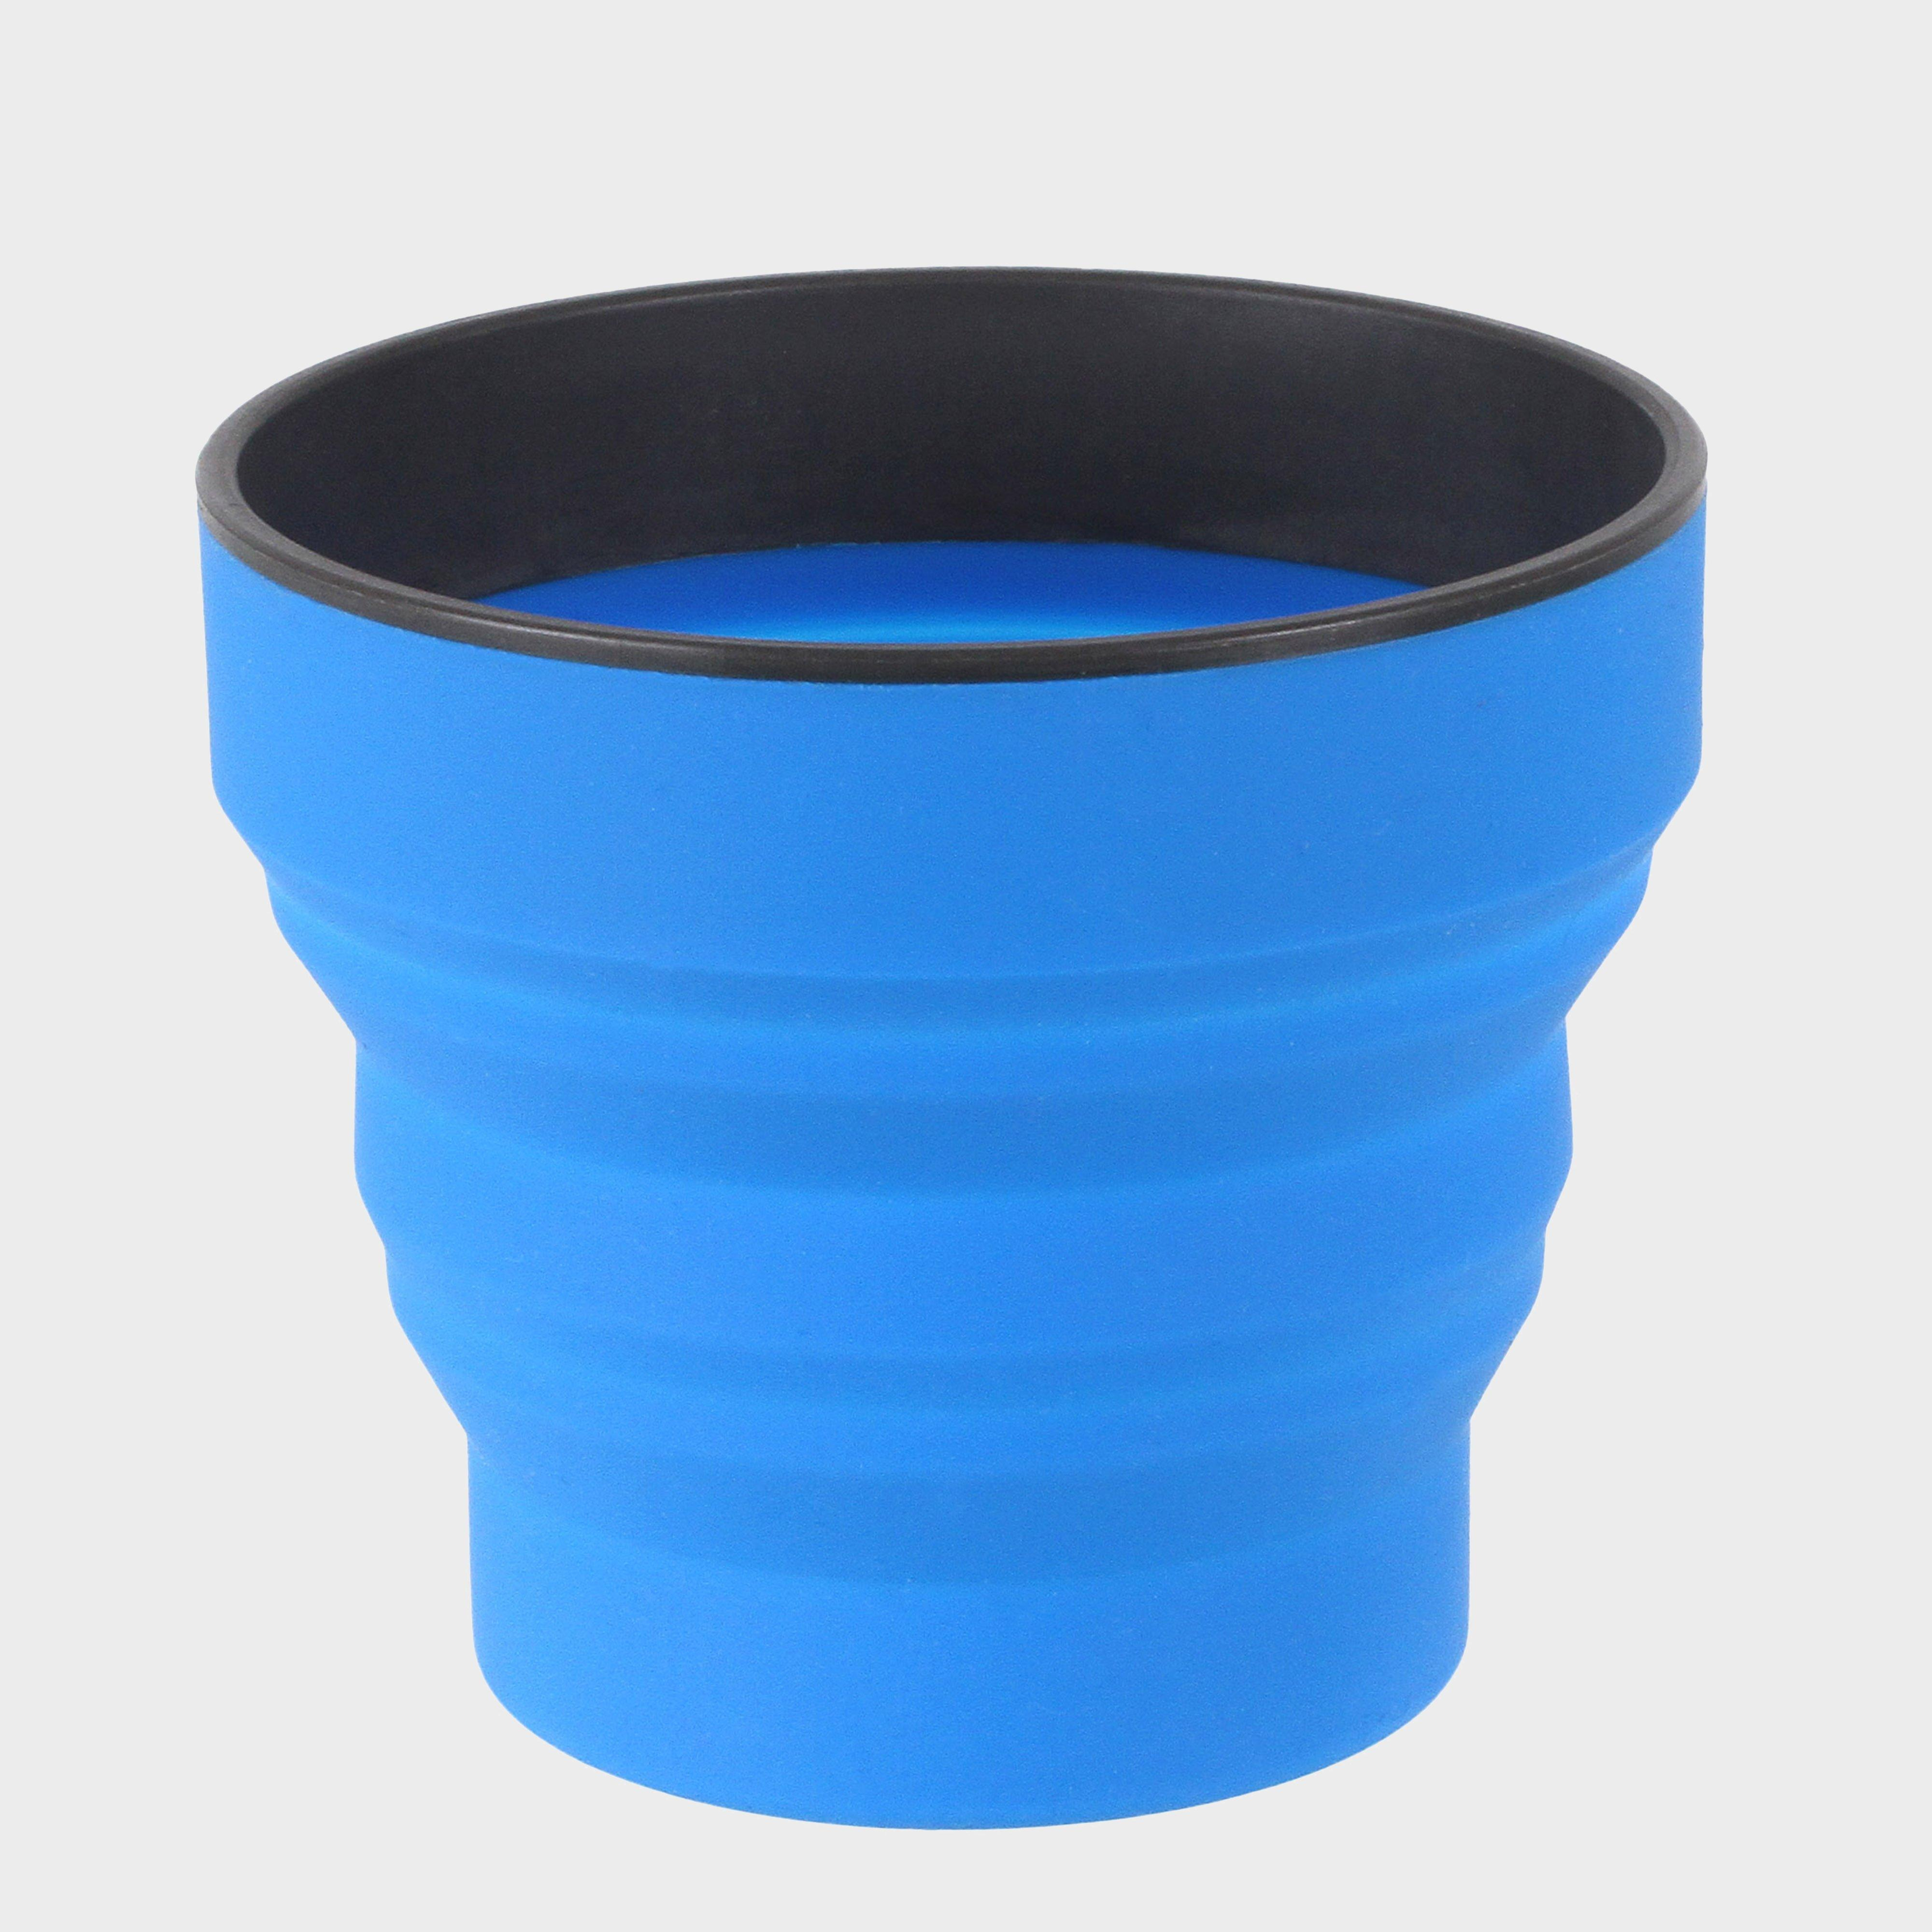 Lifeventure Lifeventure Ellipse Flexi Mug - Blue, Blue